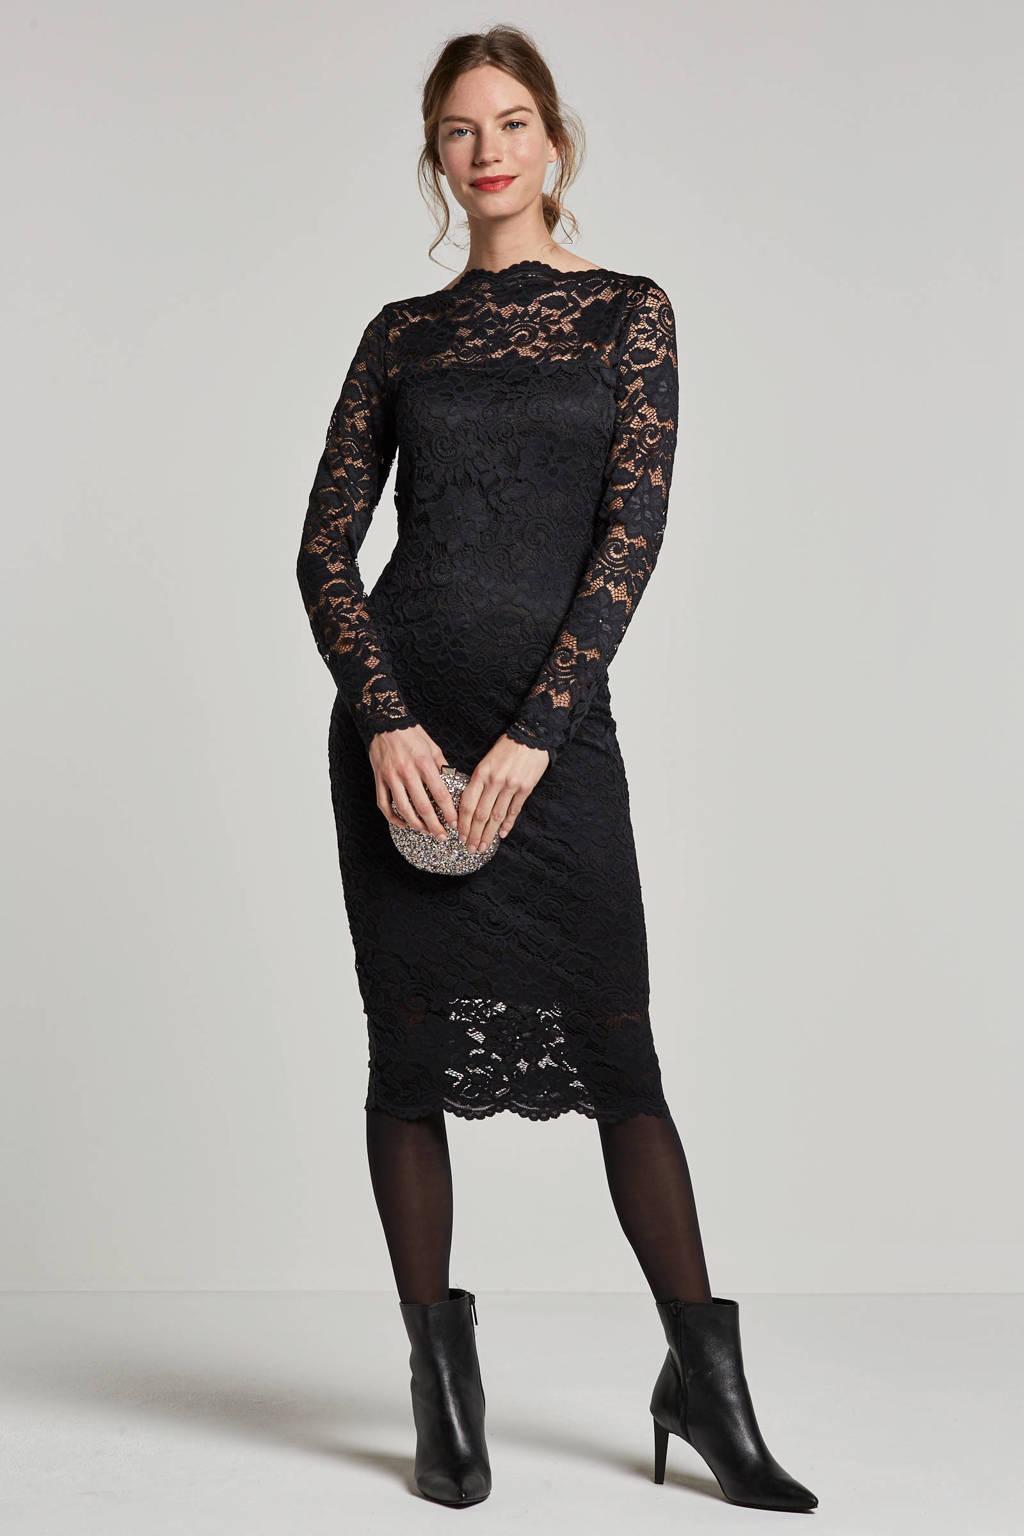 Wonderbaarlijk VILA kanten jurk | wehkamp WP-53